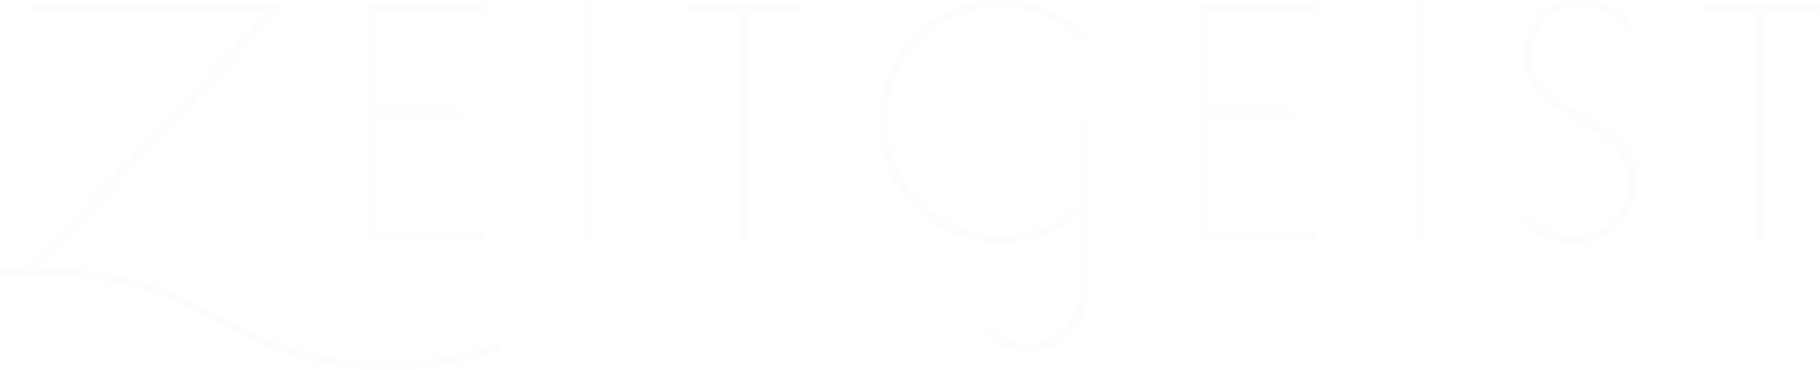 Zeitgeist_logo.png